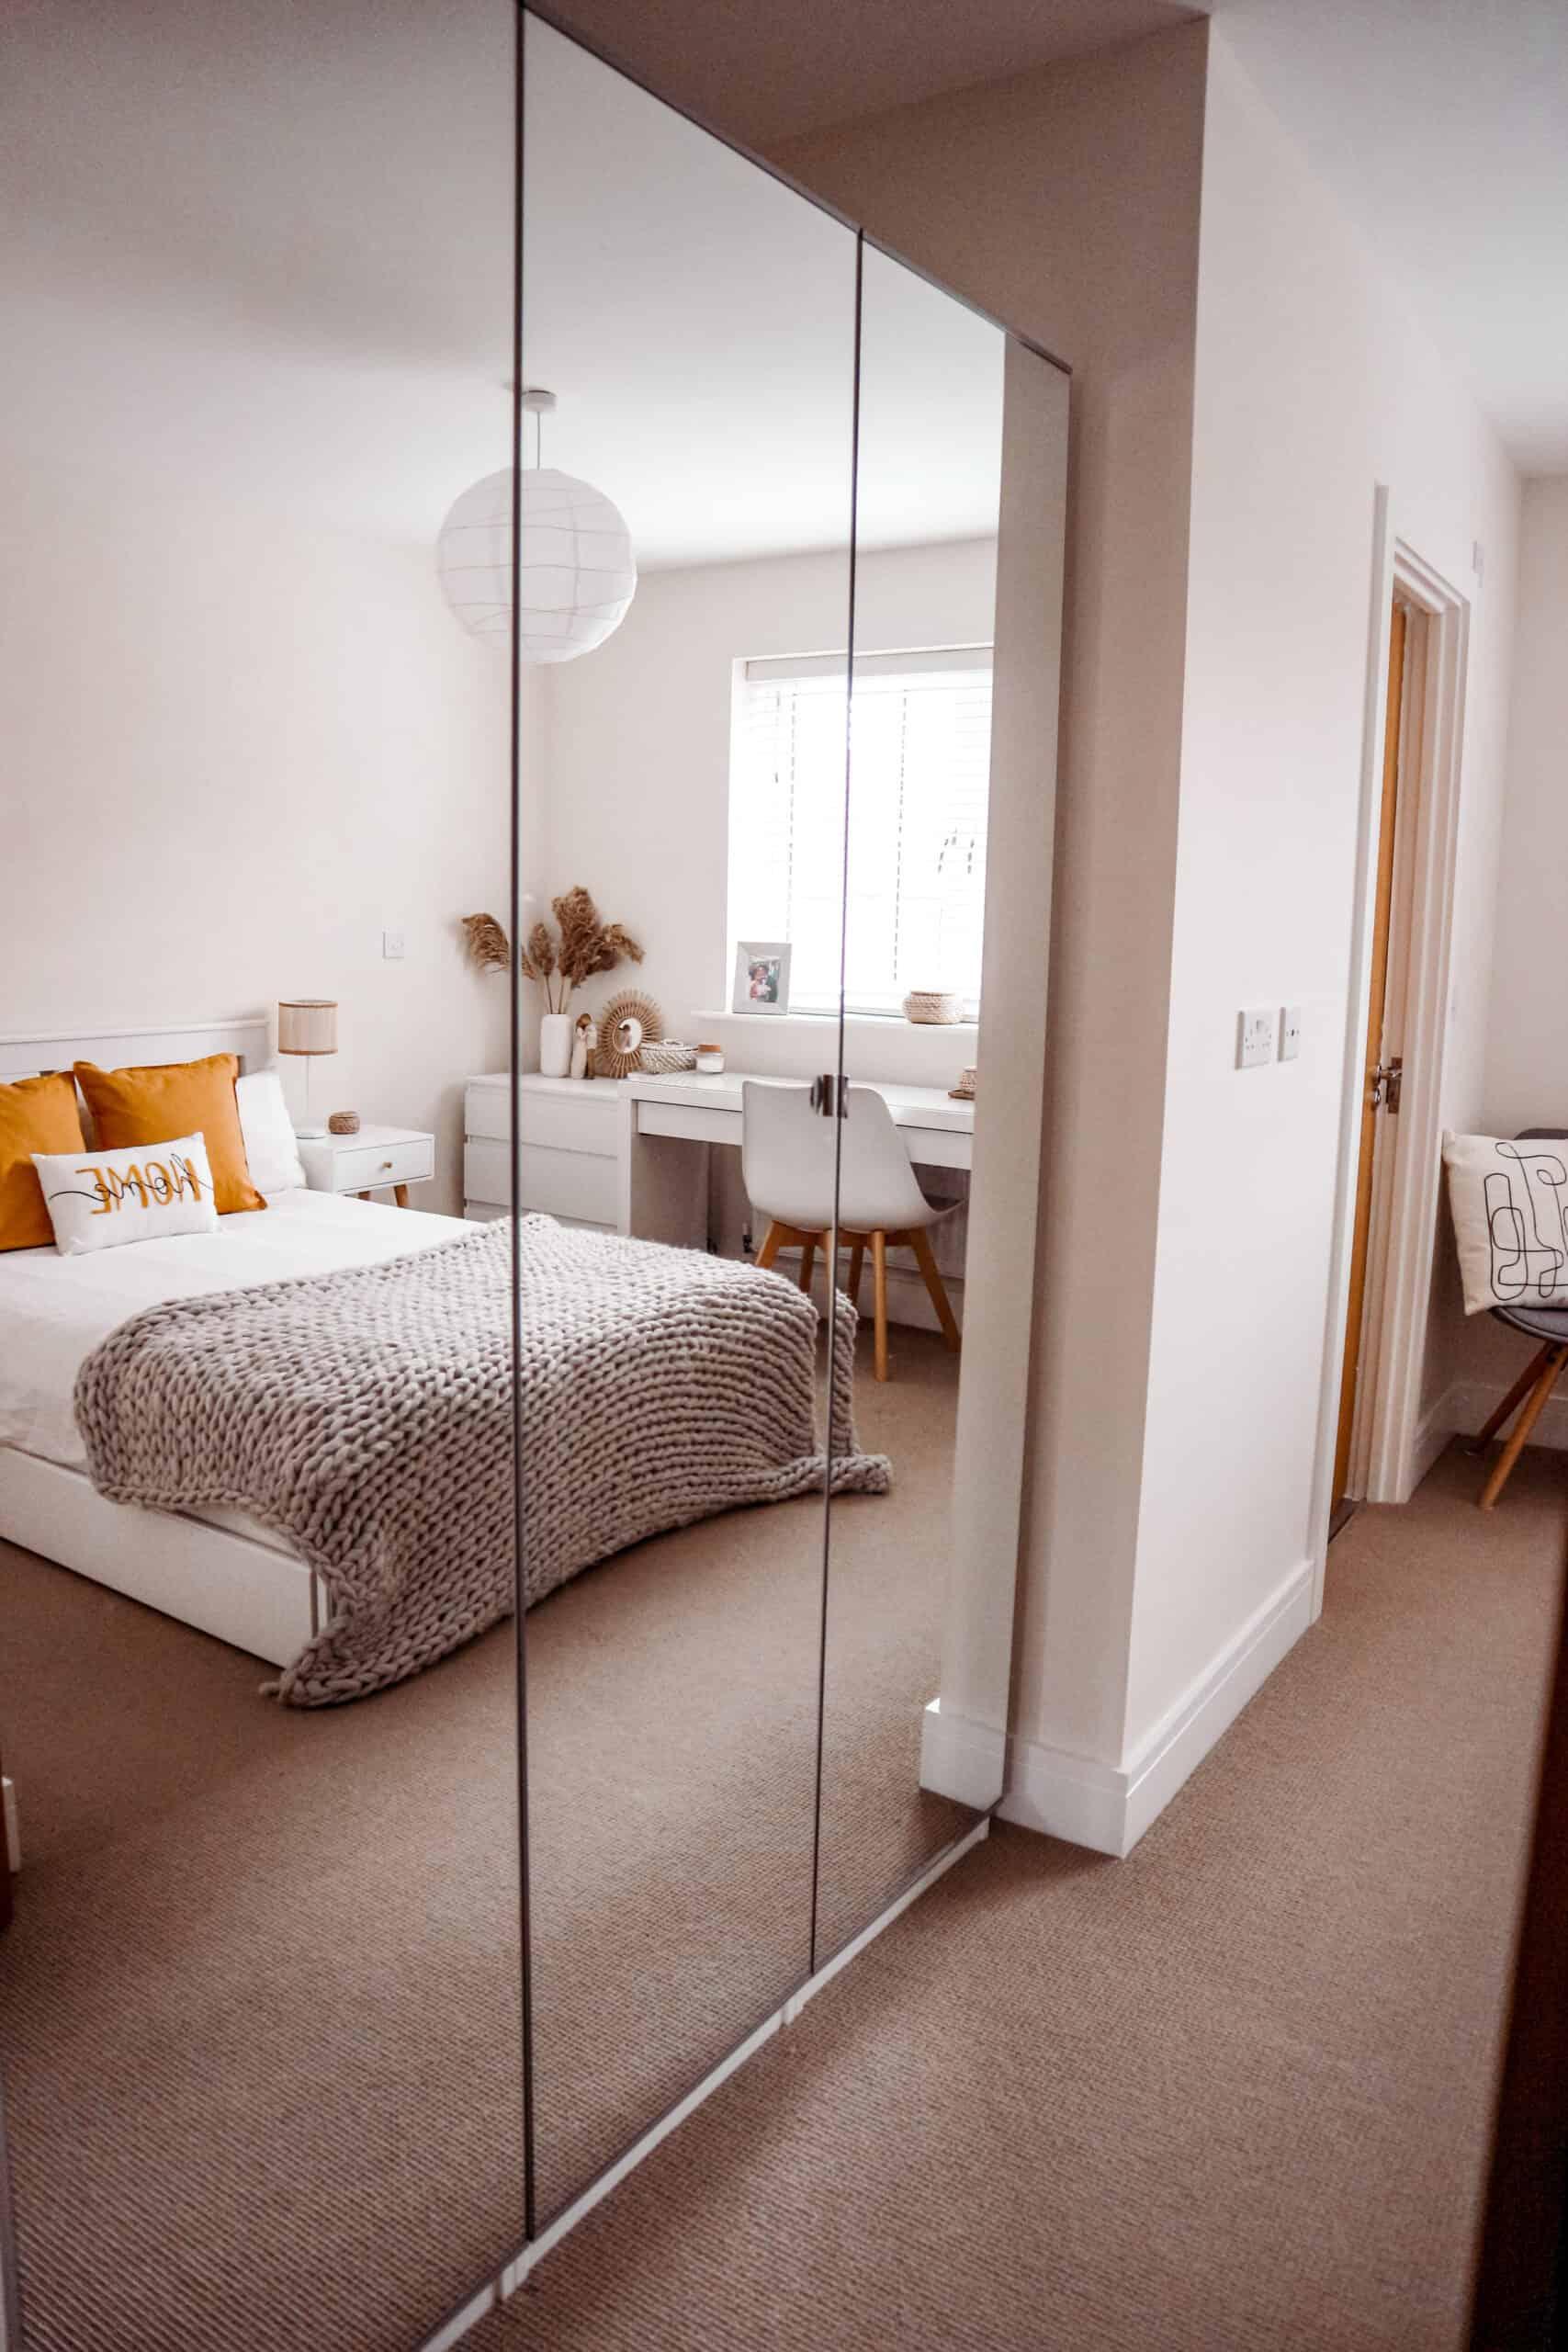 IKEA Pax mirrored wardrobe bedroom decor ideas